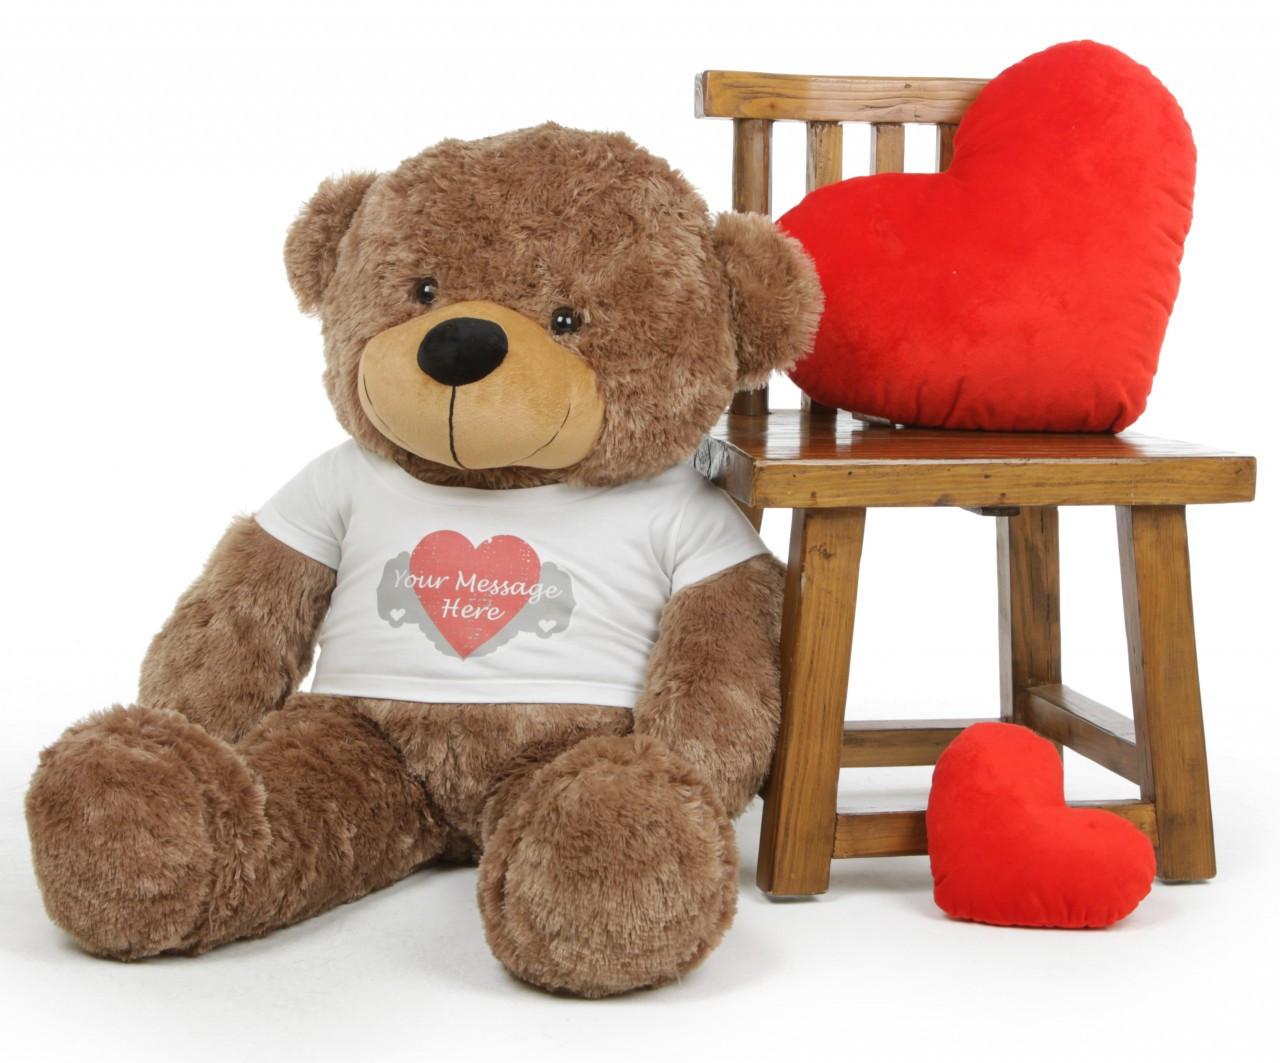 5f08e8e6fce Personalized Teddy Bear with Heart Print Tshirt Sunny Cuddles Mocha 38 inch 1  97750.1354582384.jpg c 2 imbypass on